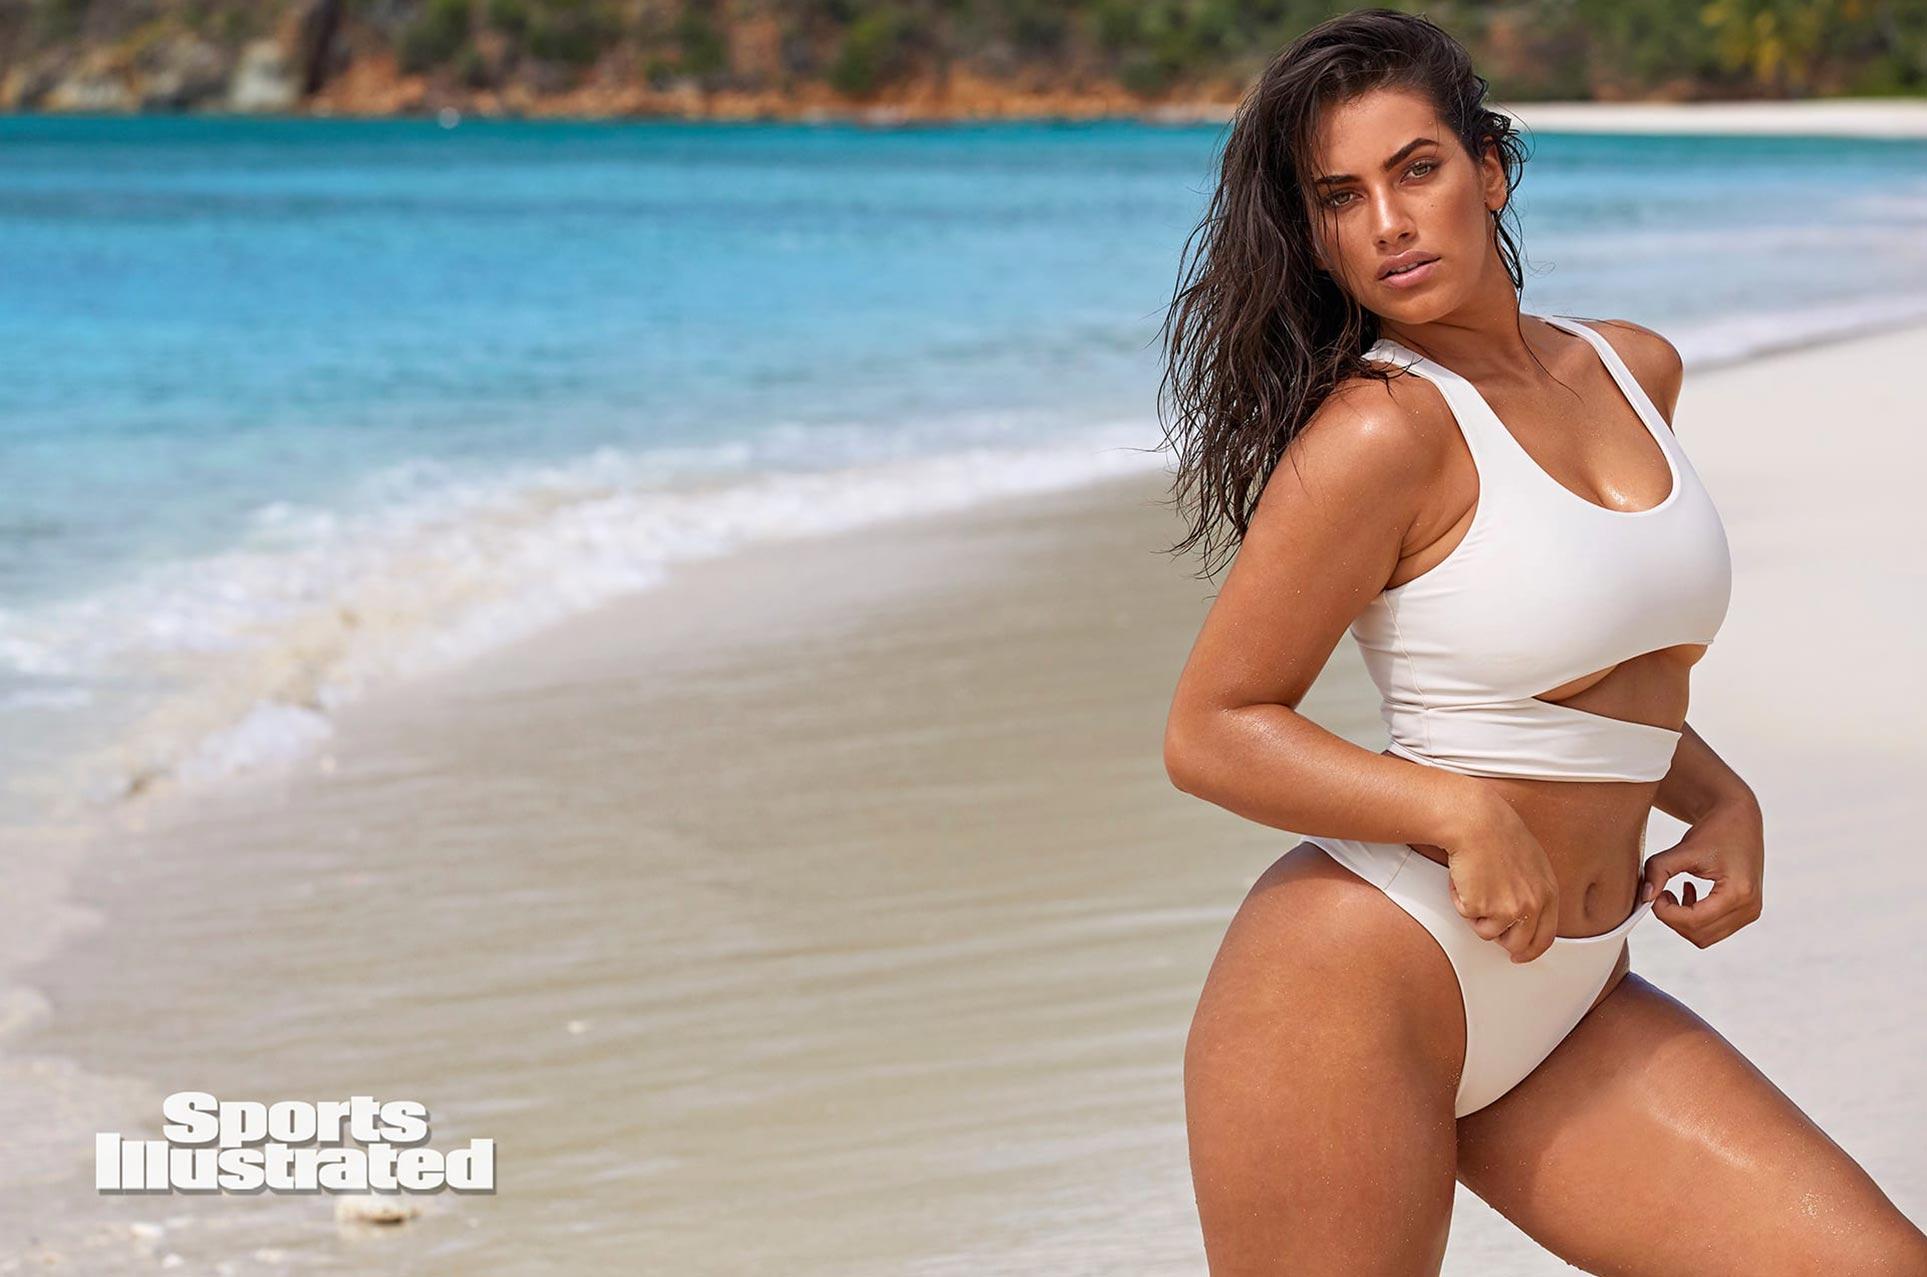 Лорена Дюран в каталоге купальников Sports Illustrated Swimsuit 2020 / фото 25